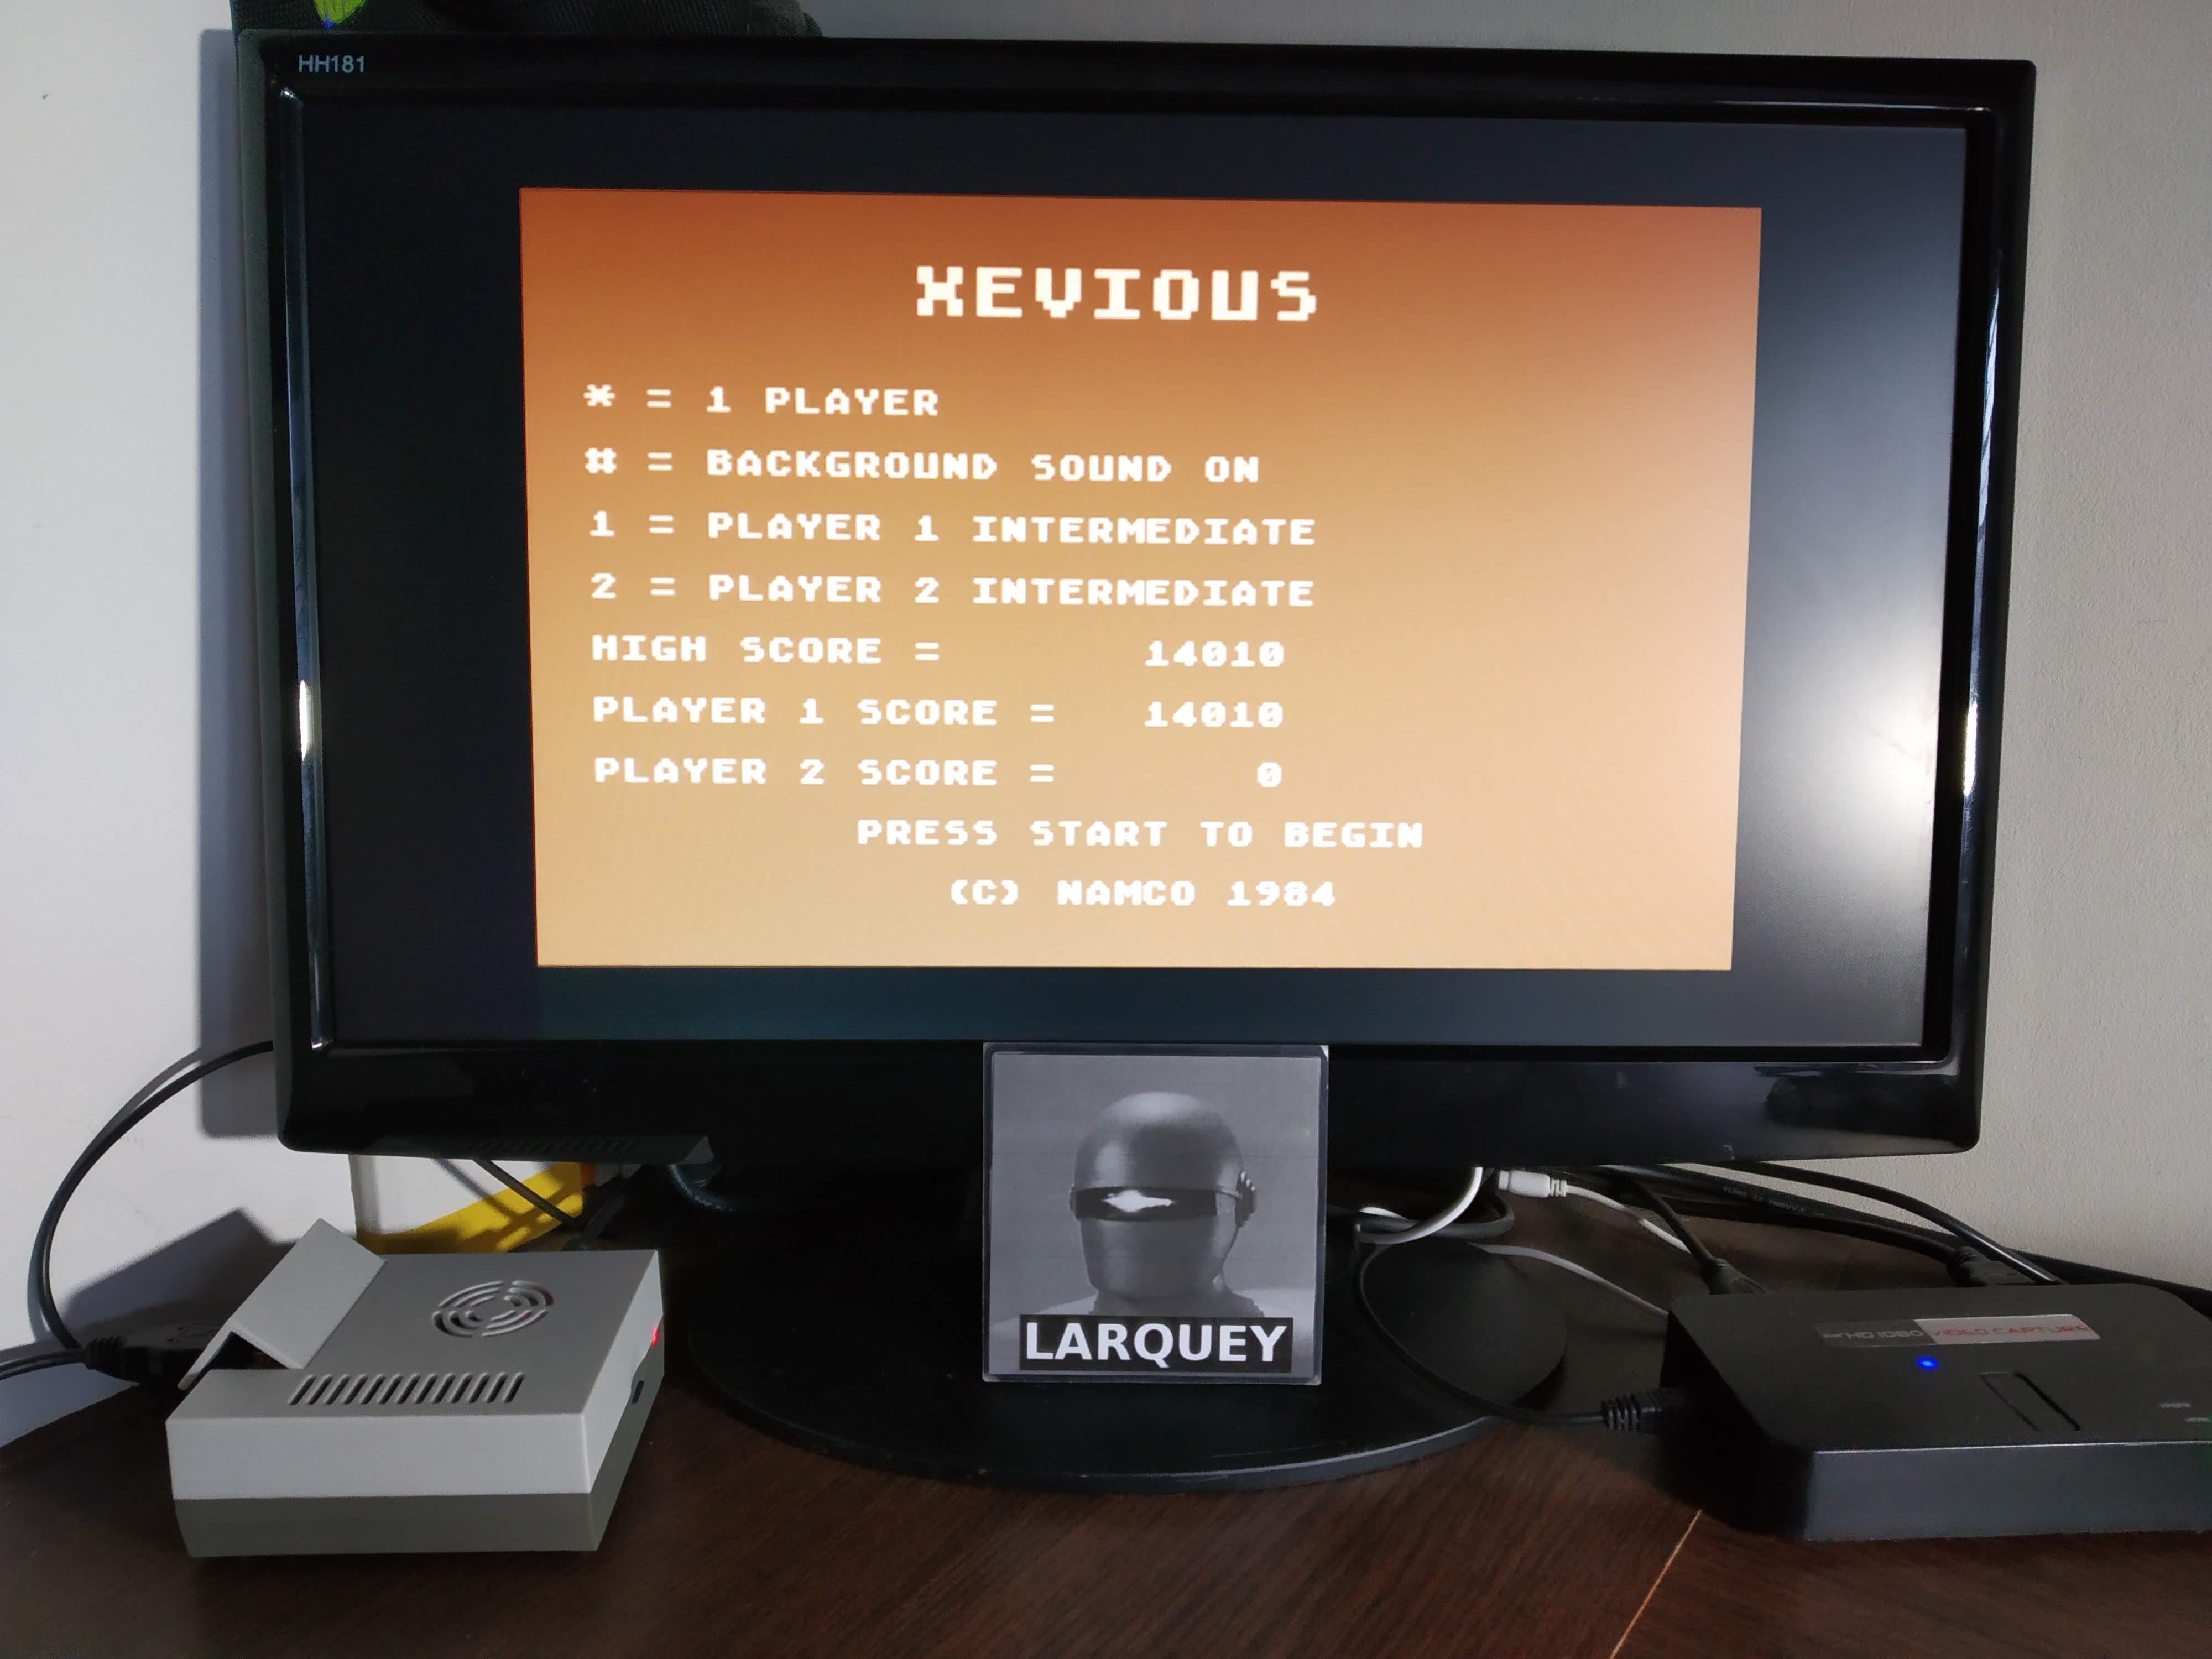 Larquey: Xevious (Atari 5200 Emulated) 14,010 points on 2019-11-11 02:51:06